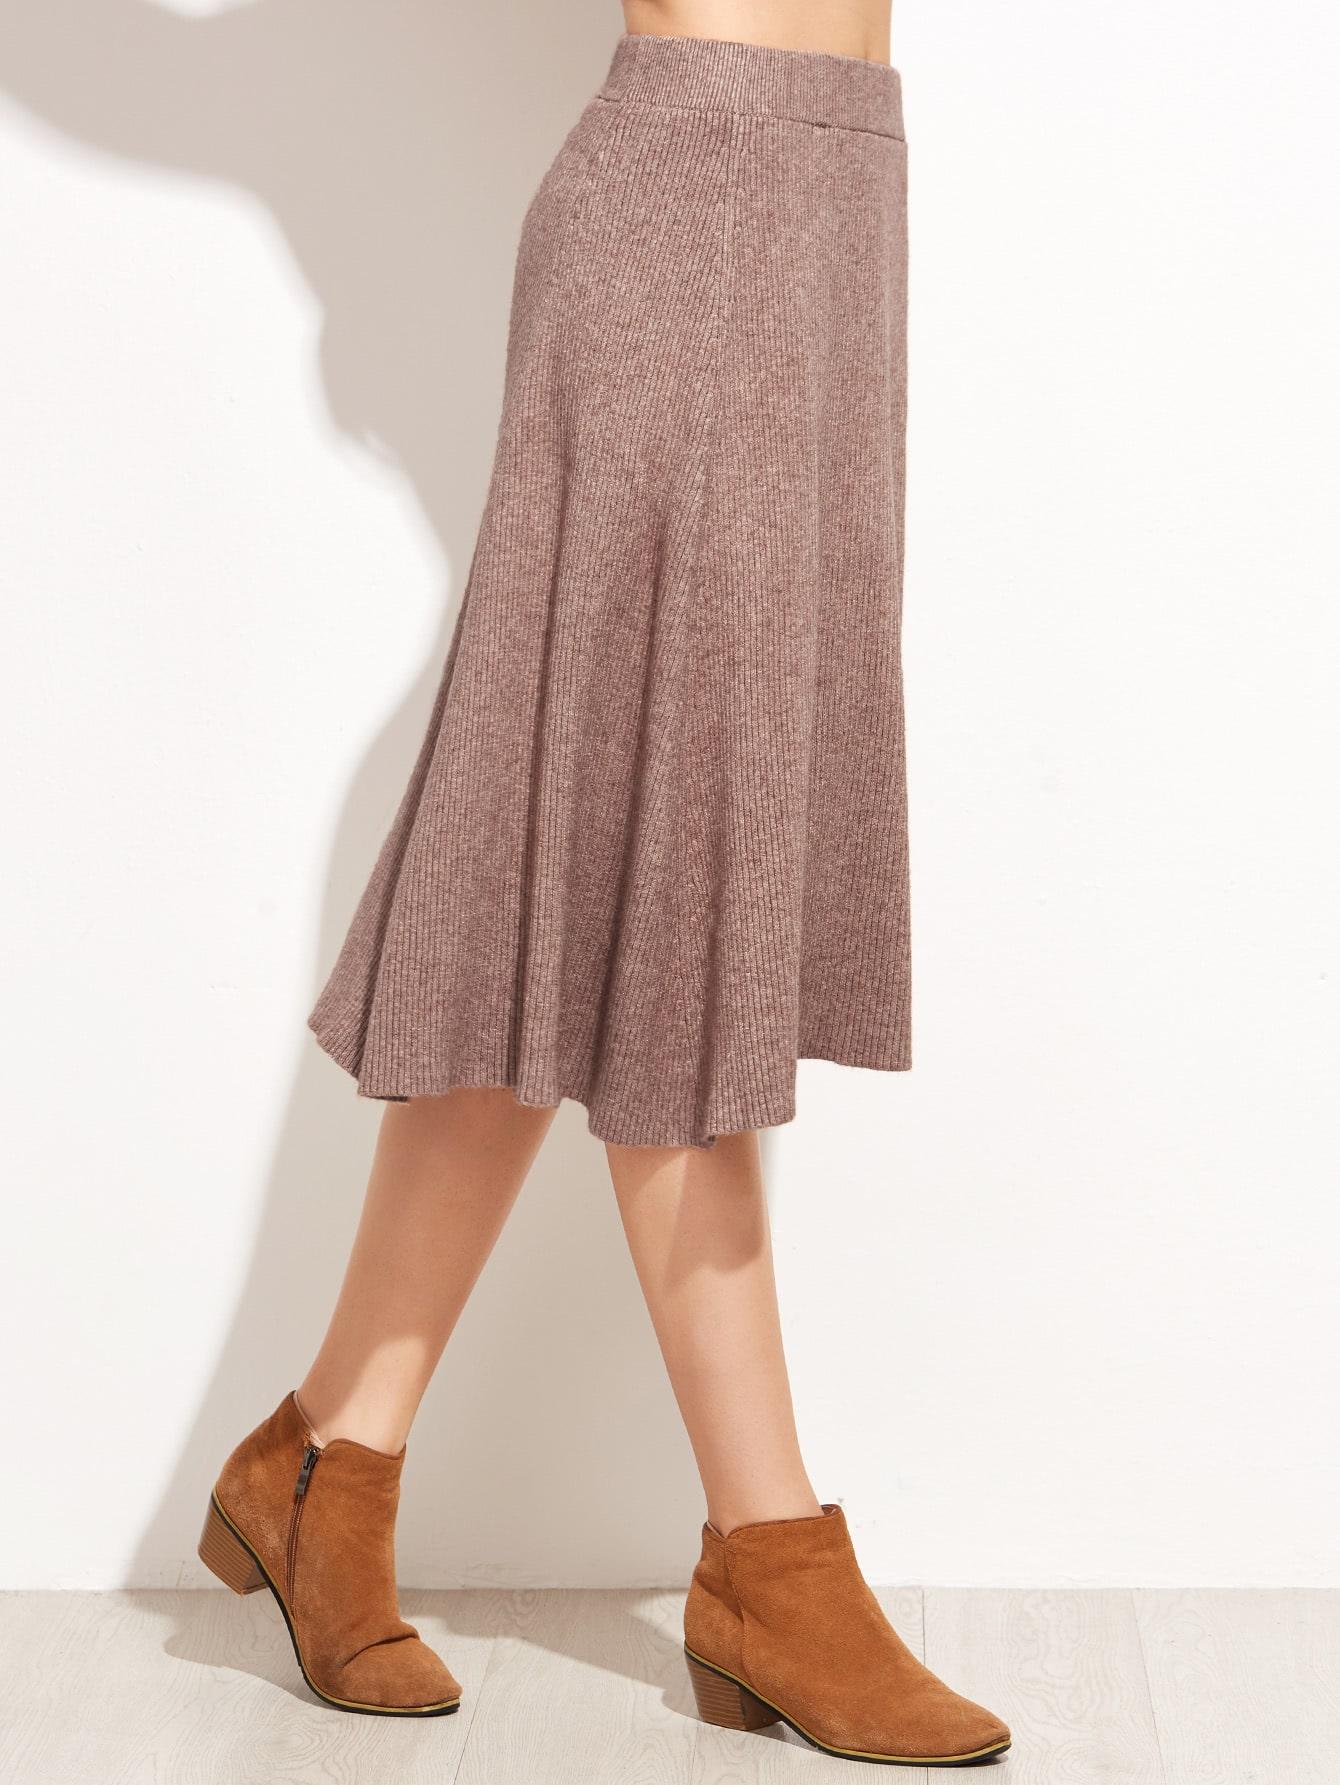 Khaki A Line Knee Lengh Skirt